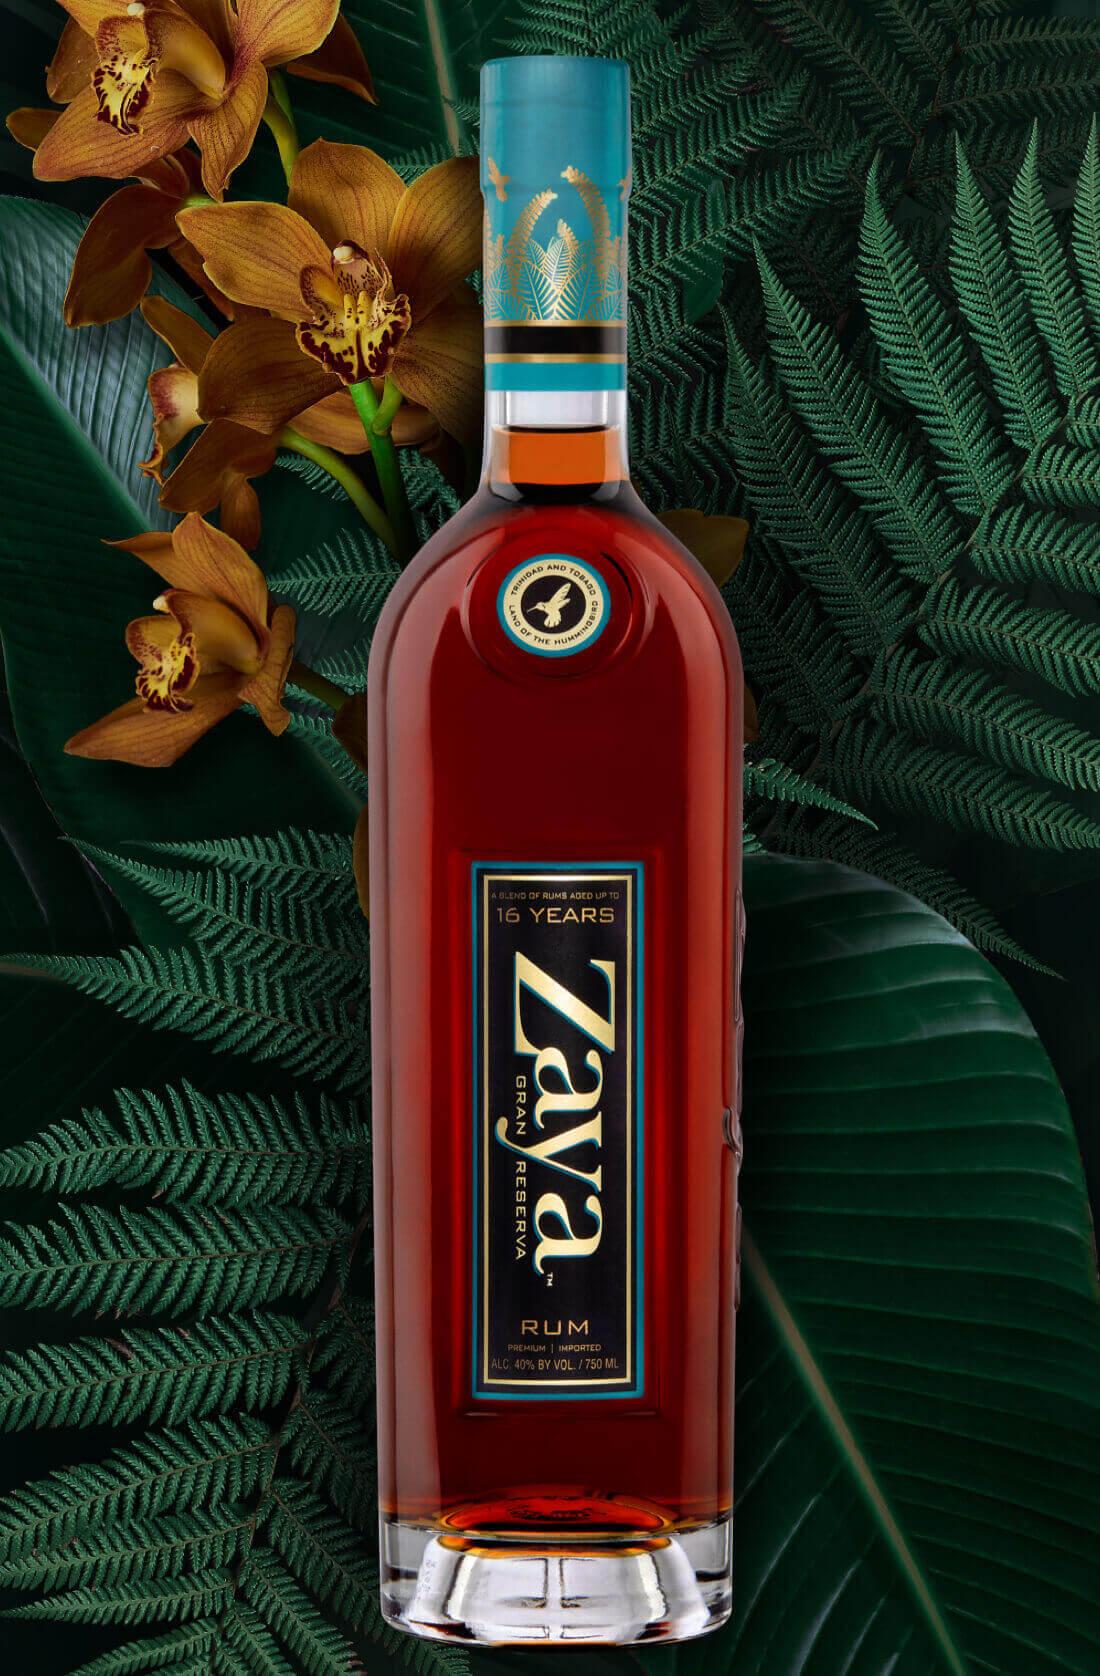 zaya gran reserva rum bottle with leaves and flowers